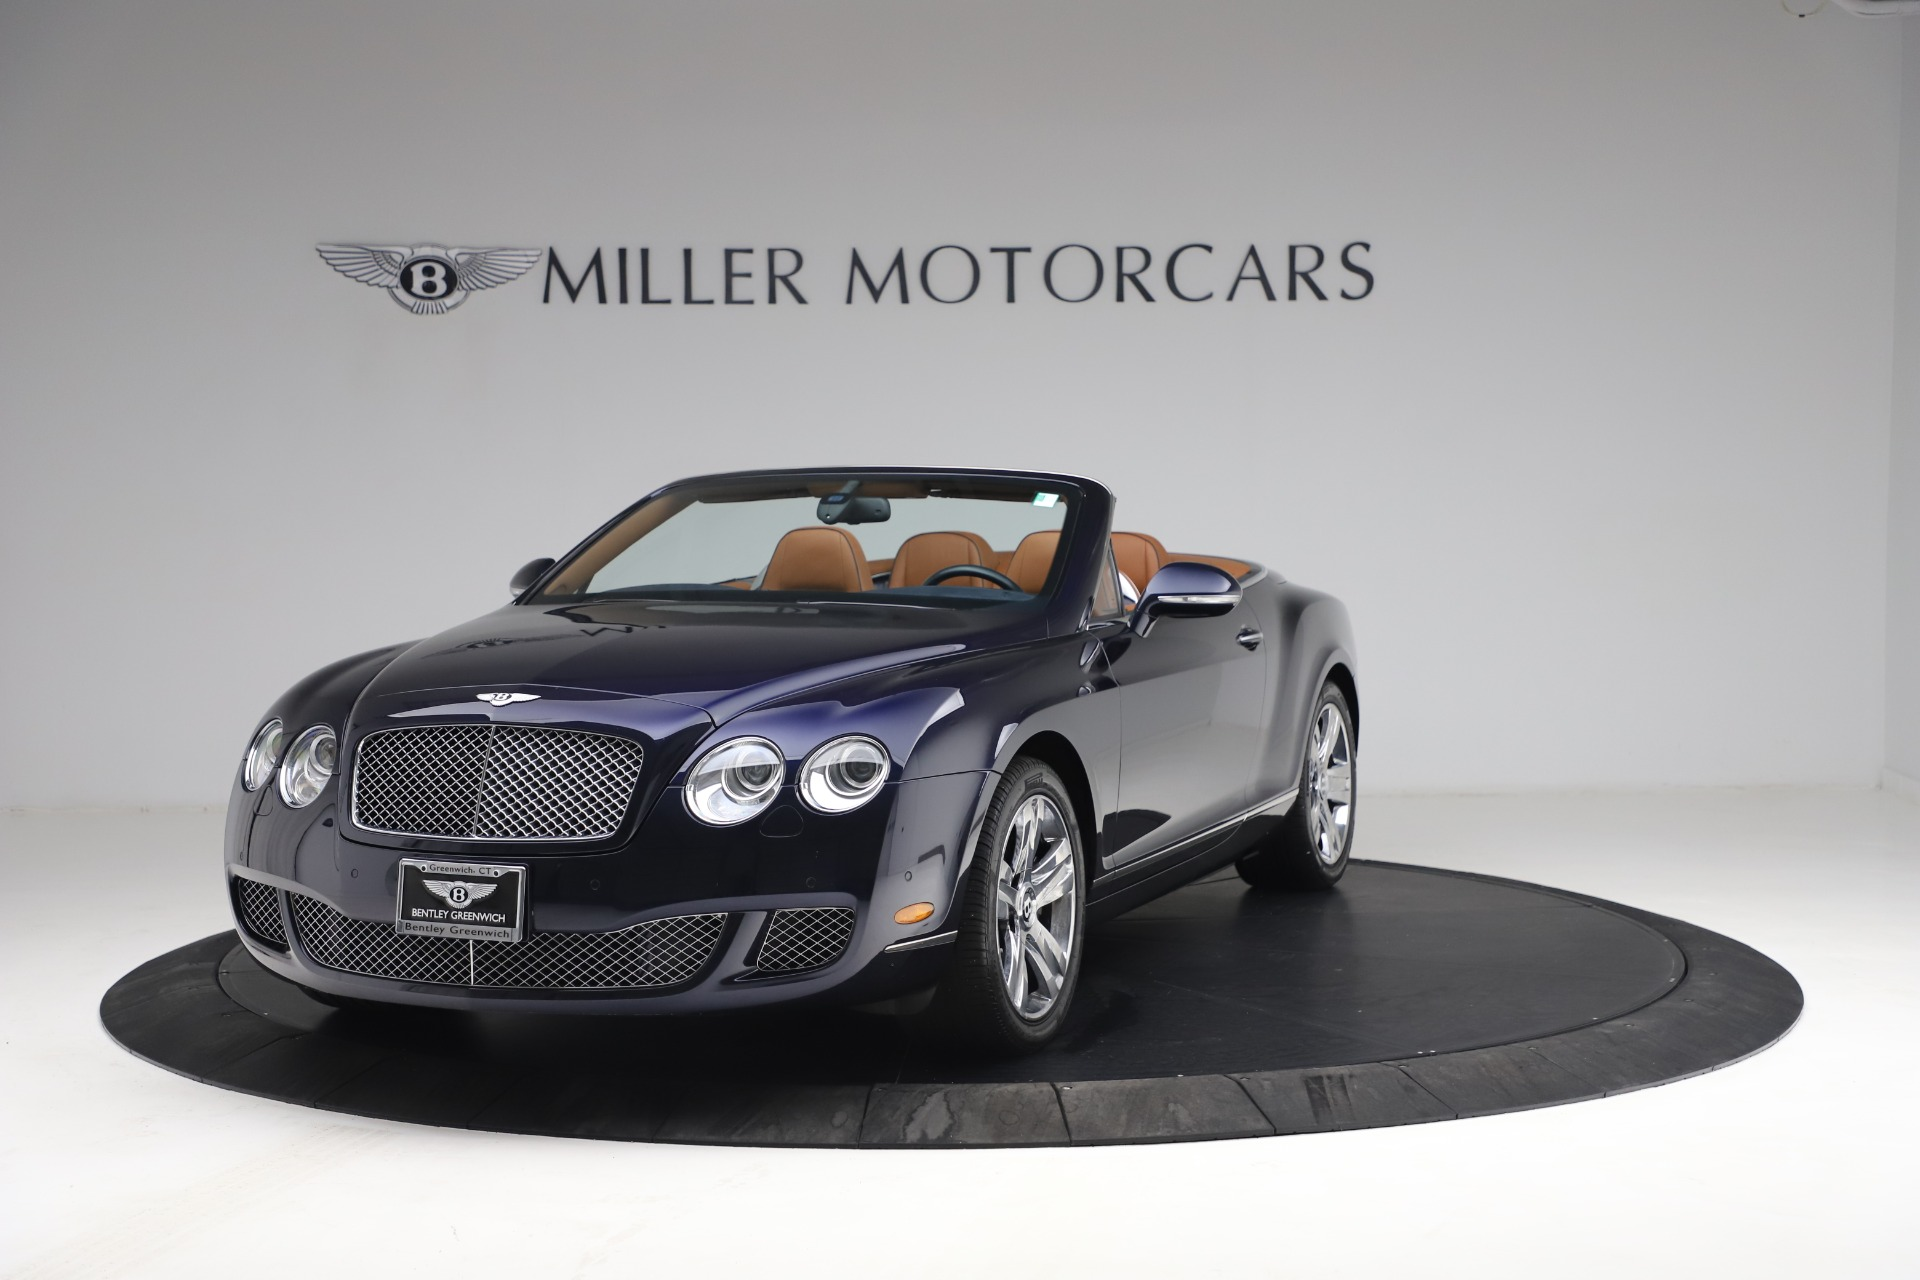 Used 2011 Bentley Continental GTC GT for sale Sold at Alfa Romeo of Westport in Westport CT 06880 1